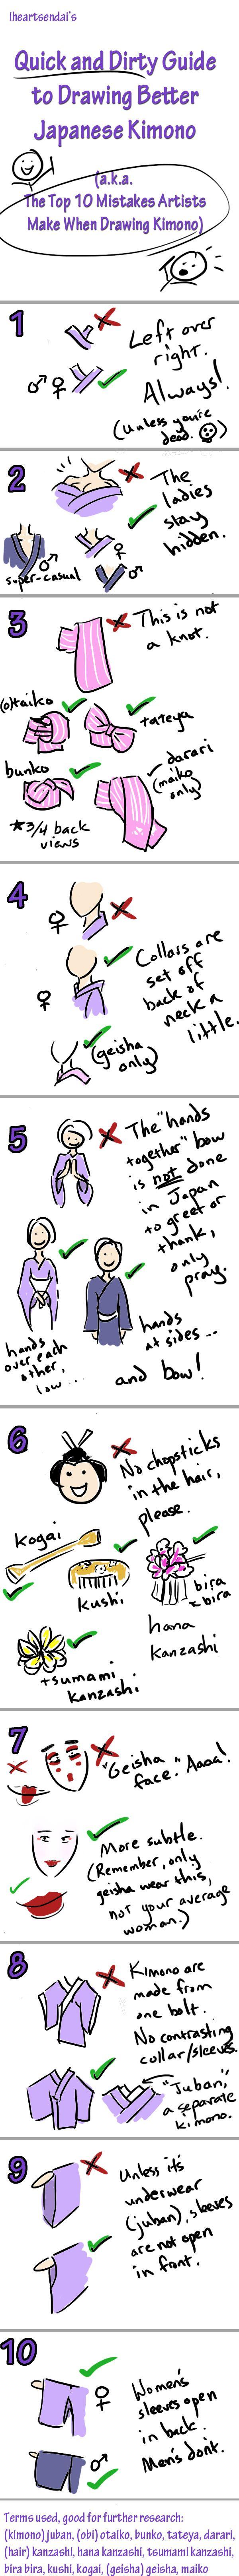 Tutorial: Draw Better Kimono by iheartsendai.deviantart.com on @deviantART